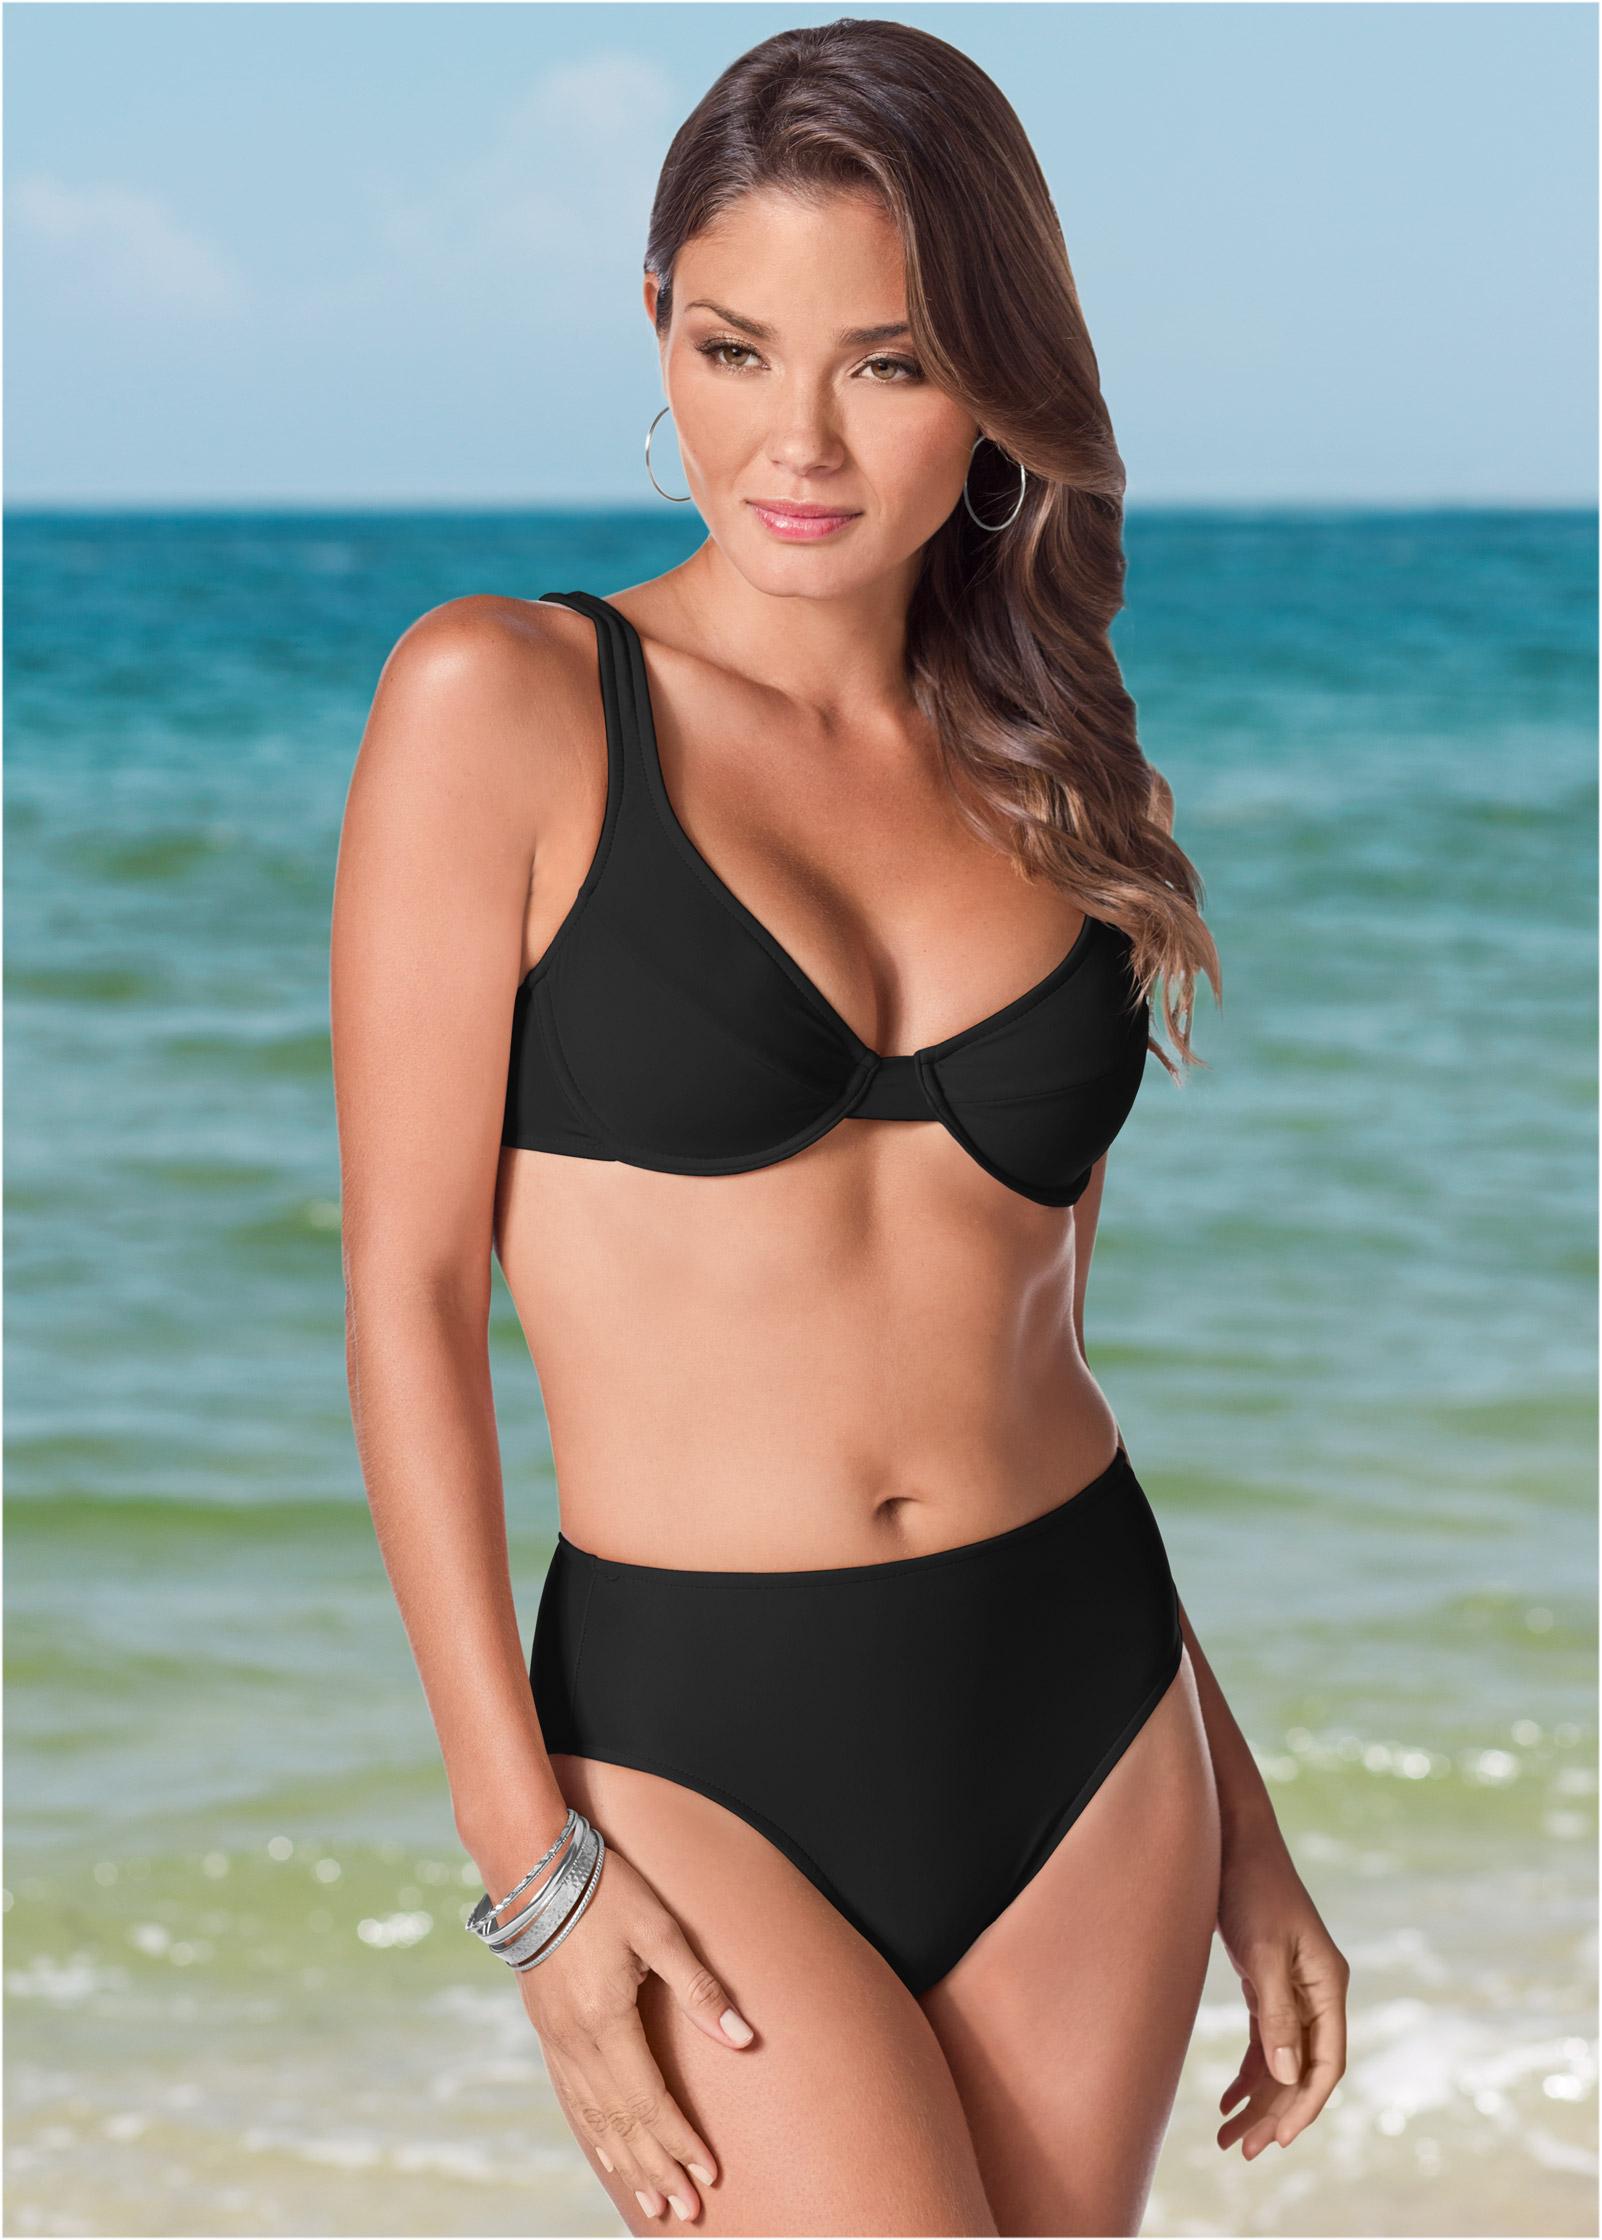 excellent idea will 2010 bikini model mayhem something is